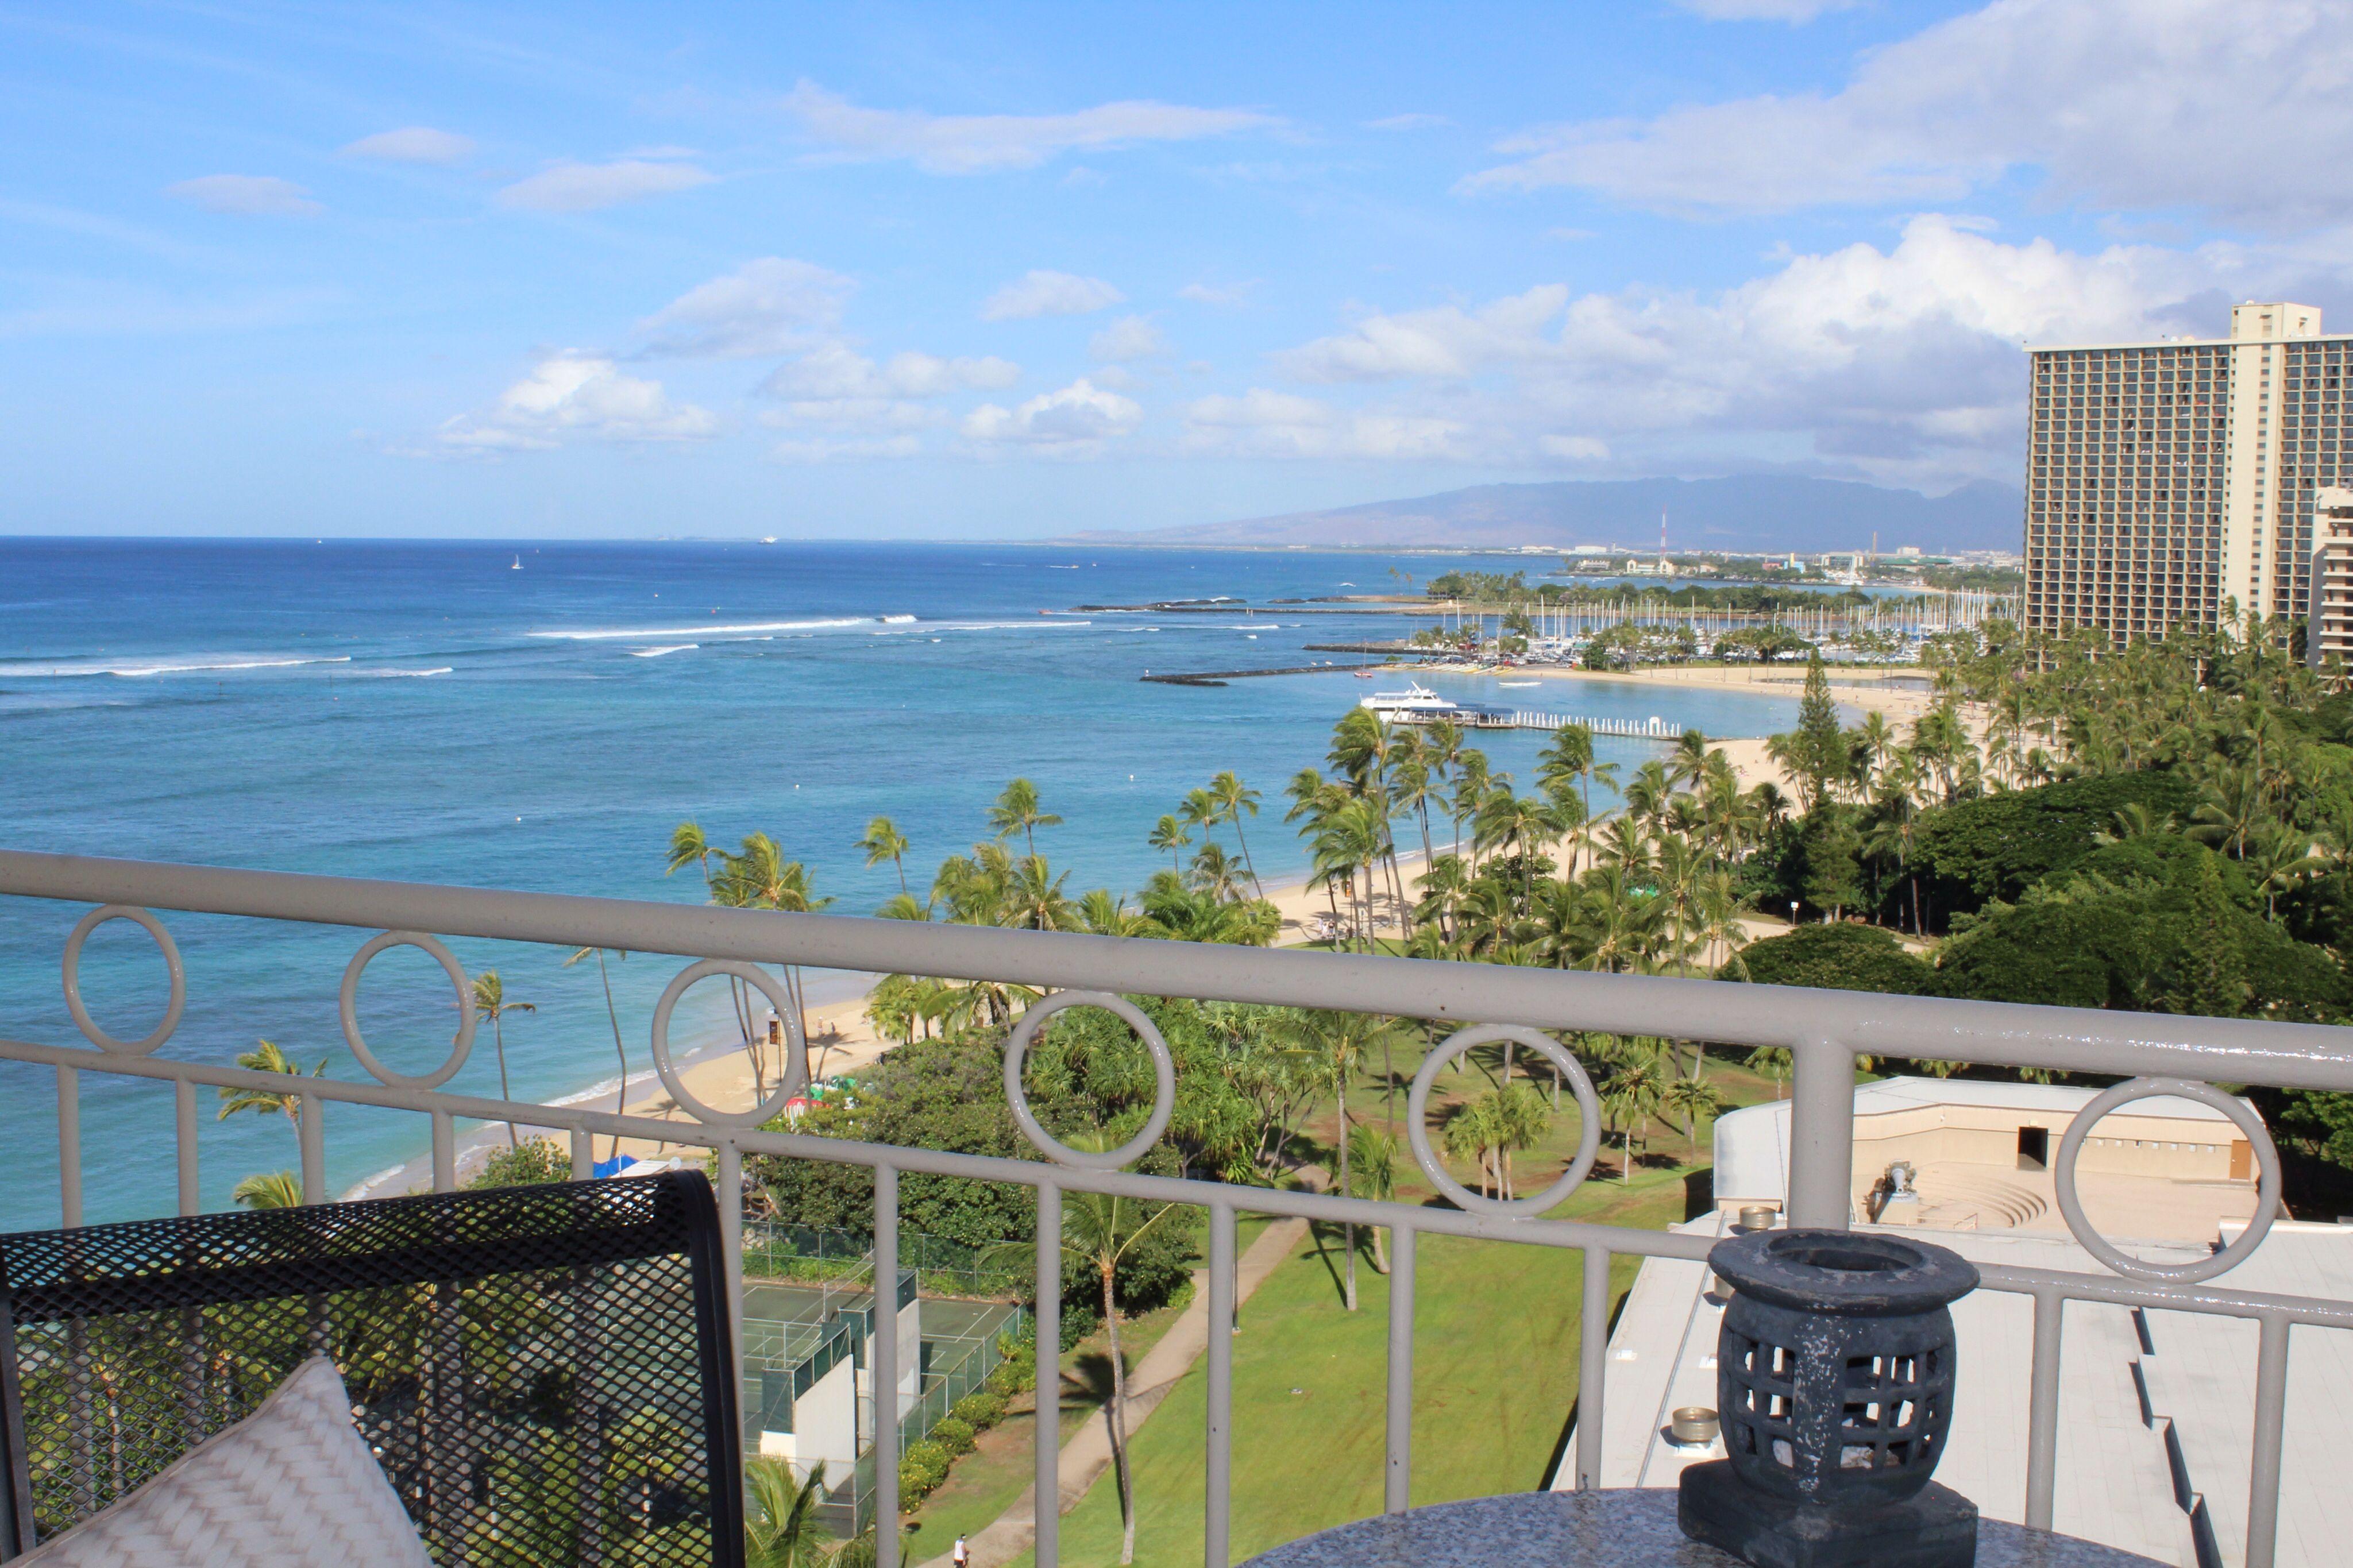 View from our condo on waikiki beach waikiki beach